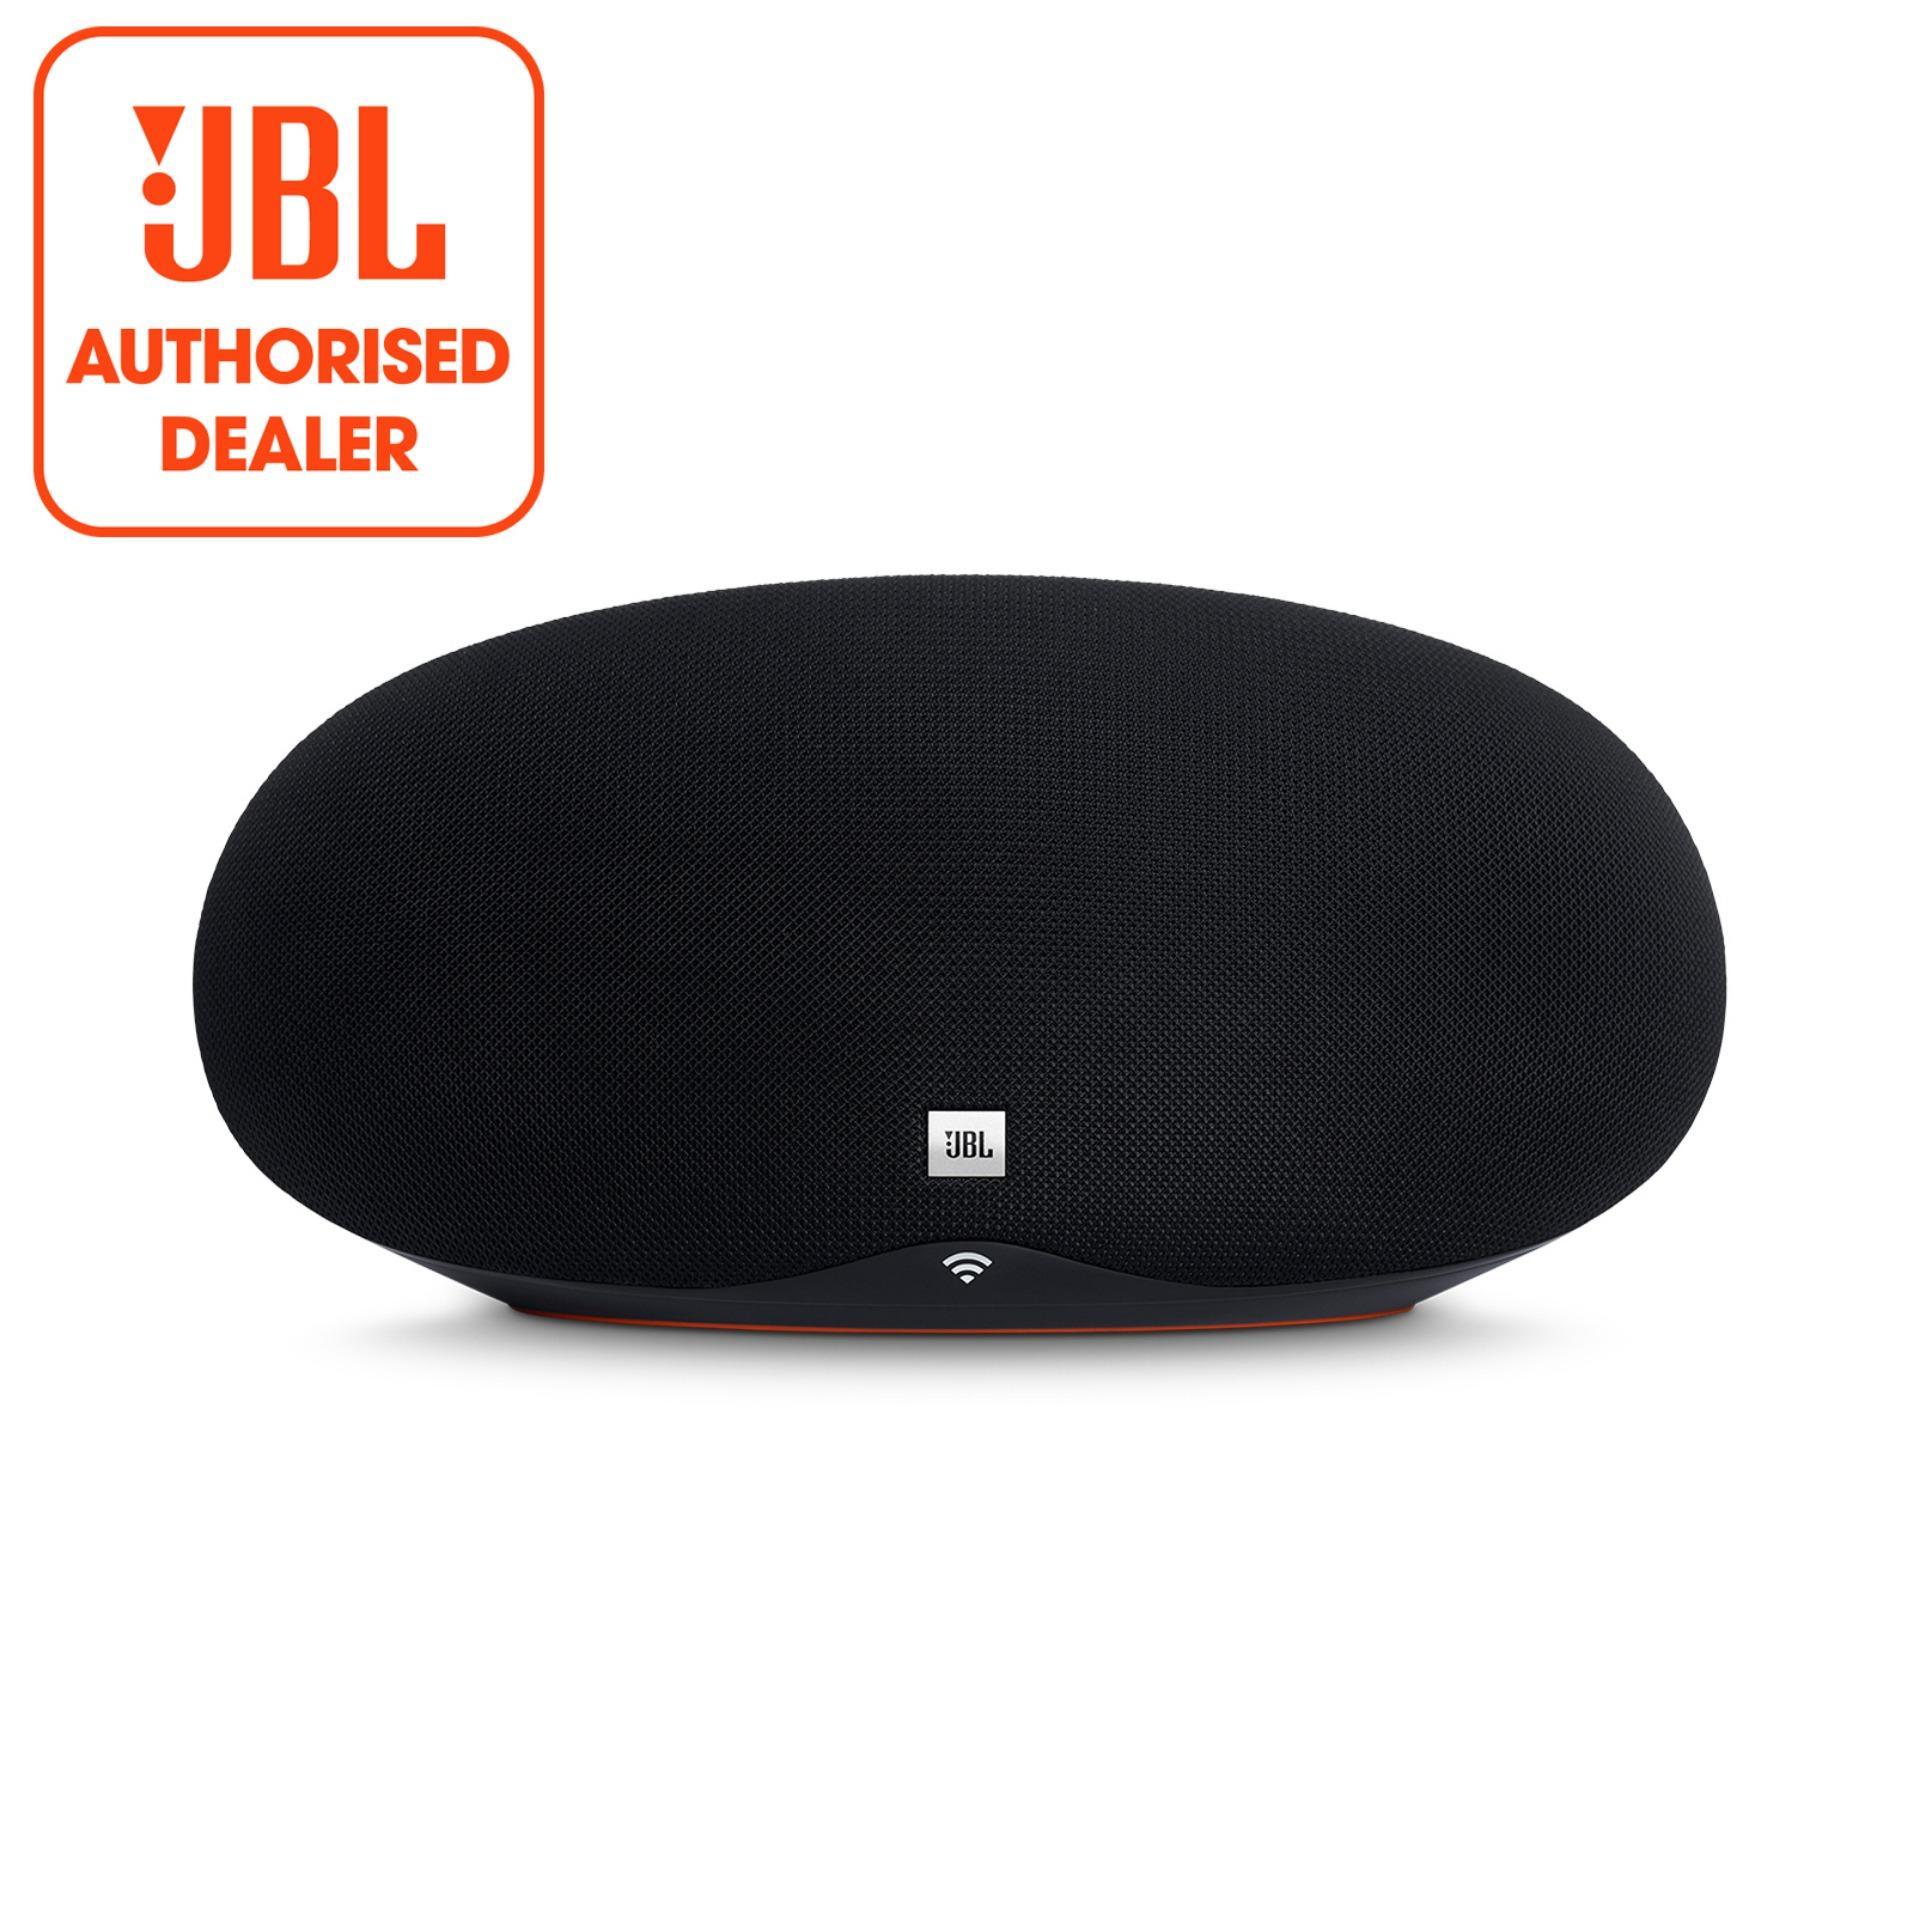 Buy Jbl Playlist Wireless Speaker With Chromecast Built In Cheap On Singapore